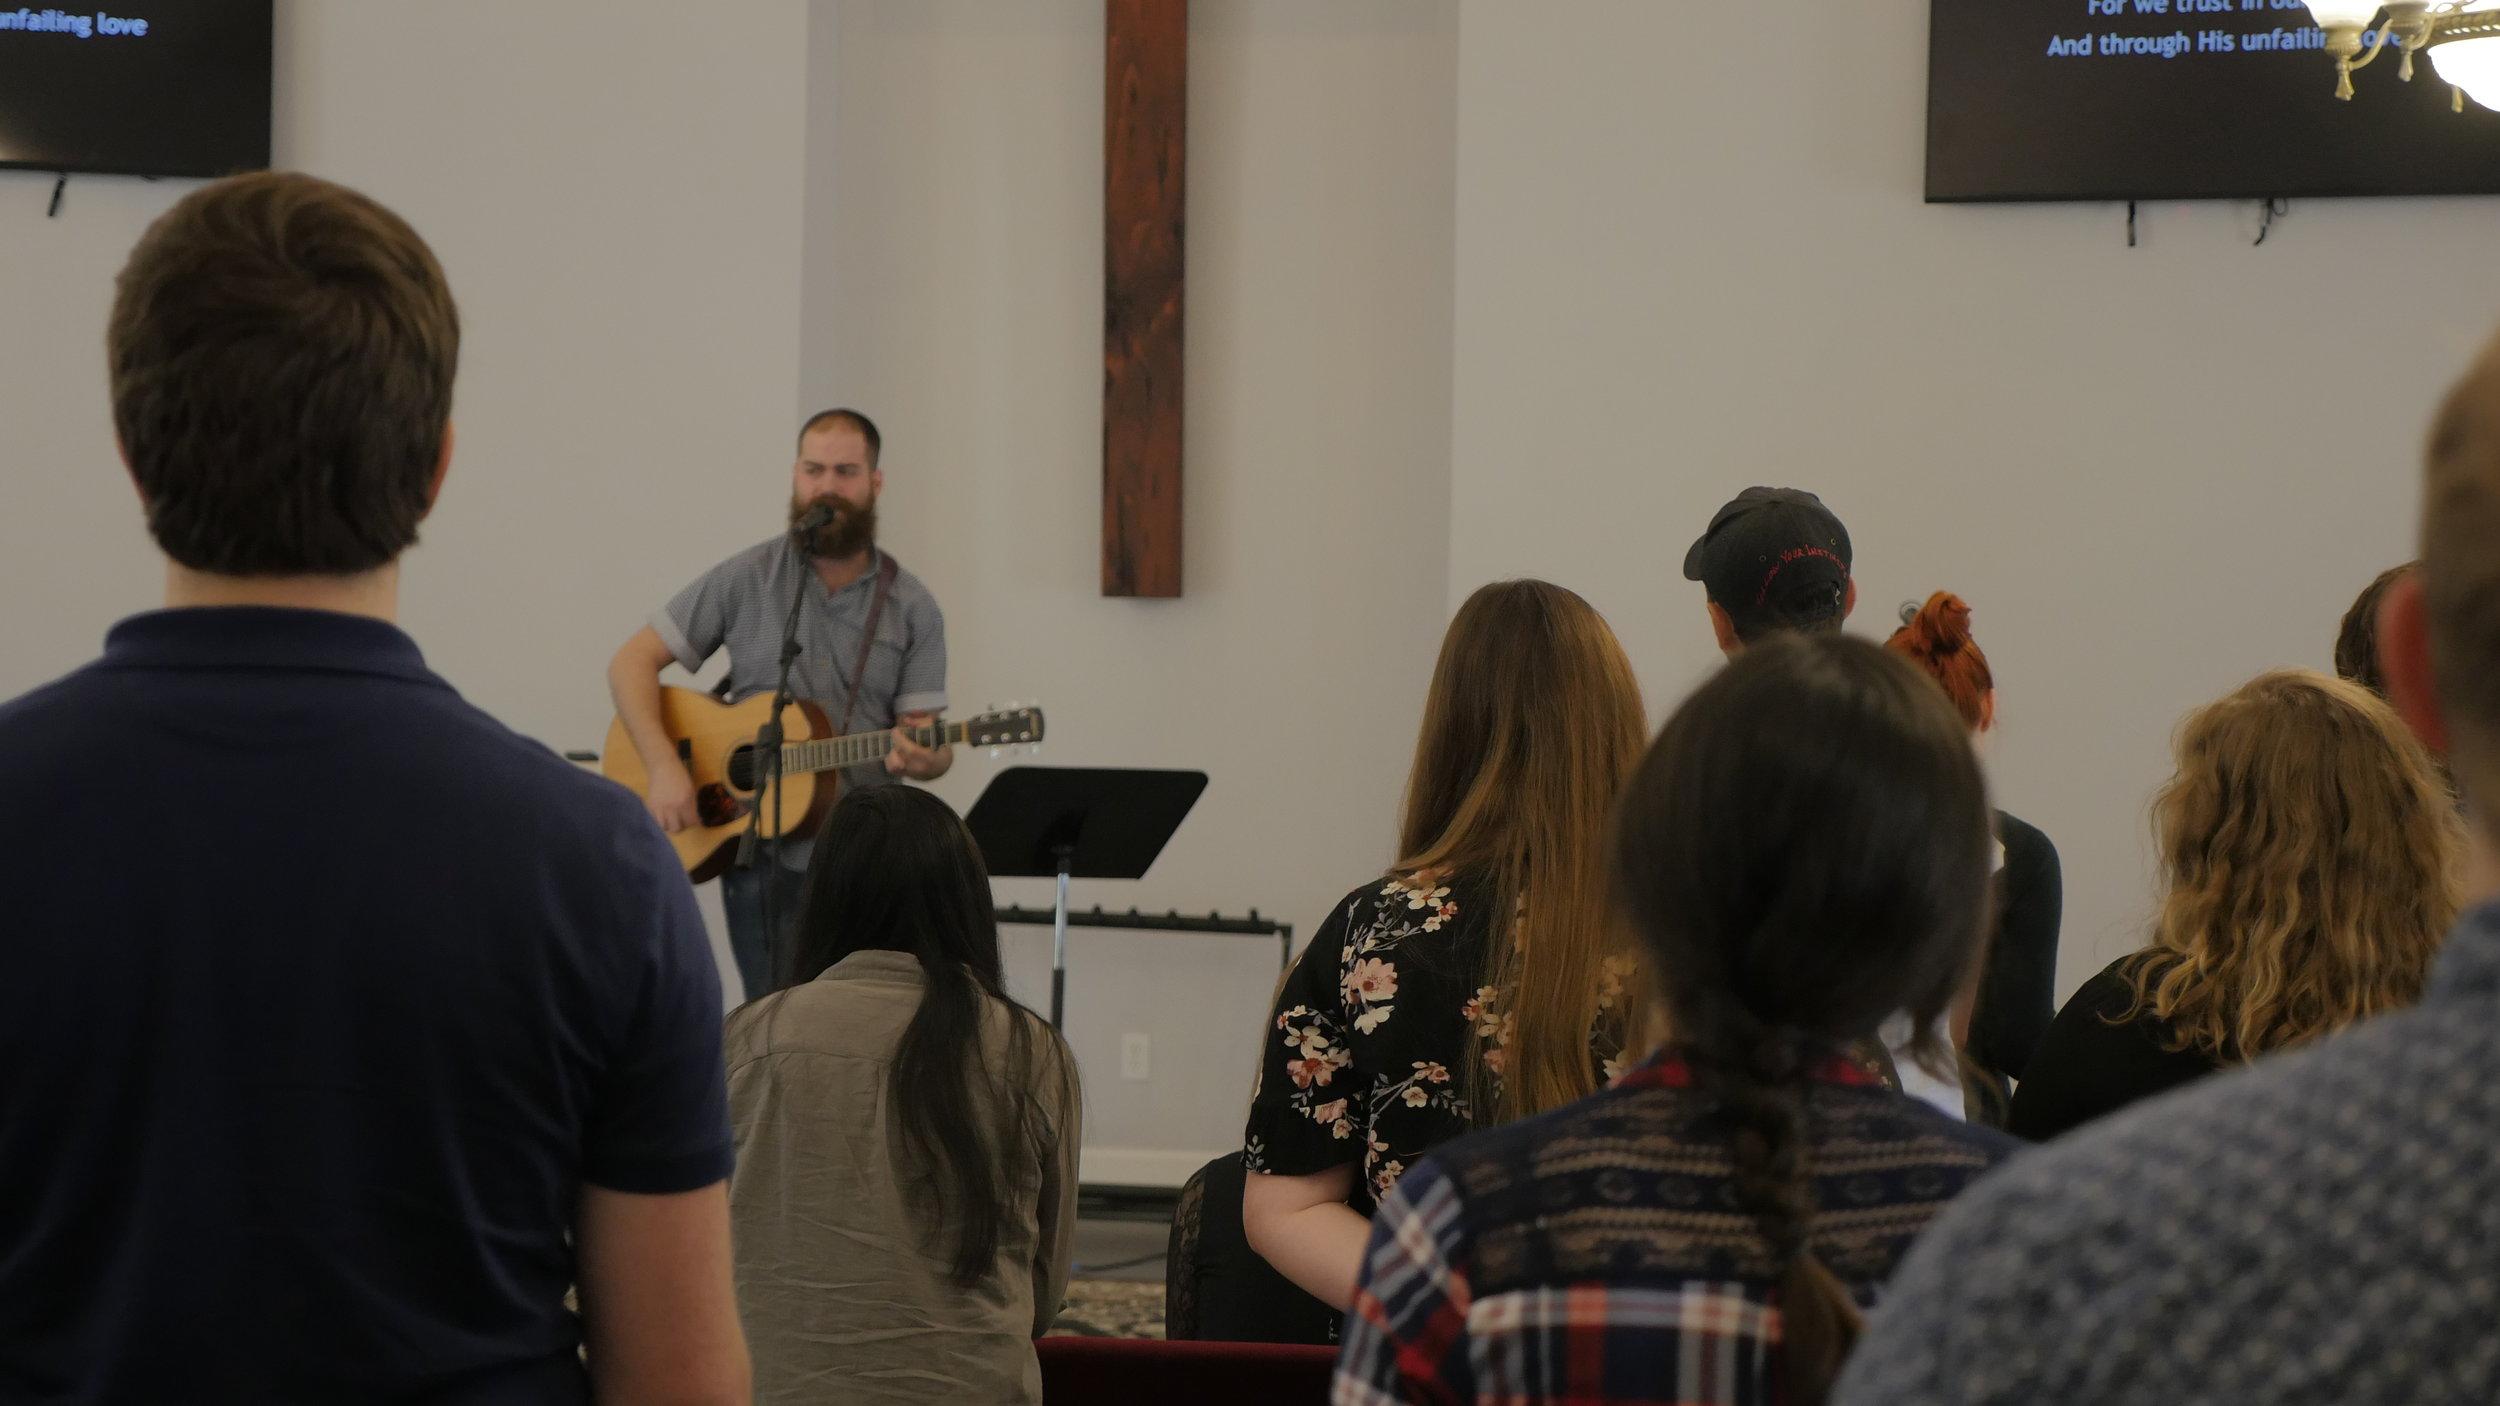 Redeemer city church -